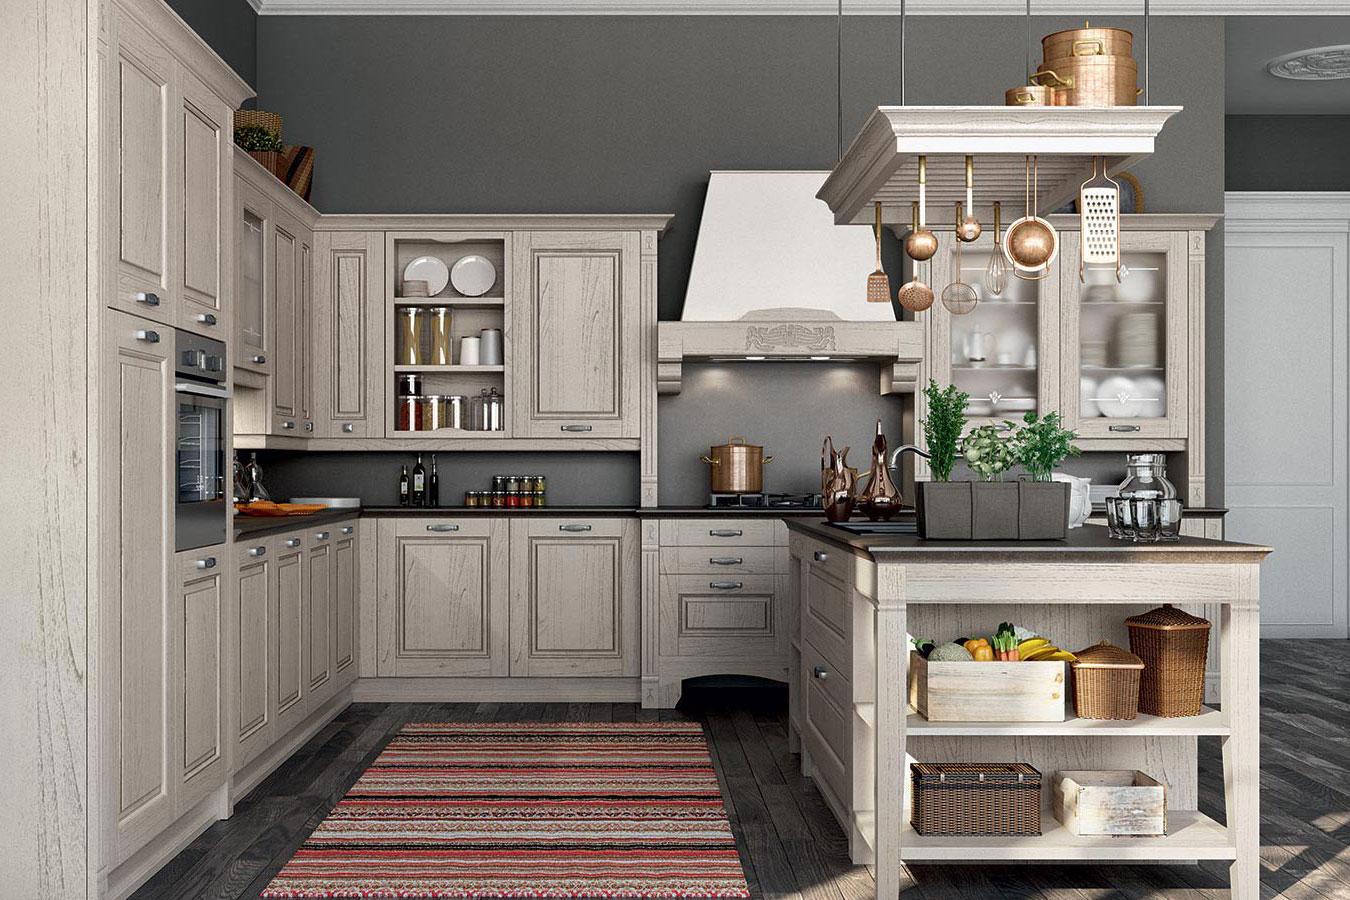 Cucina classica verona di arredo3 righetti mobili novara for Cucina arreda